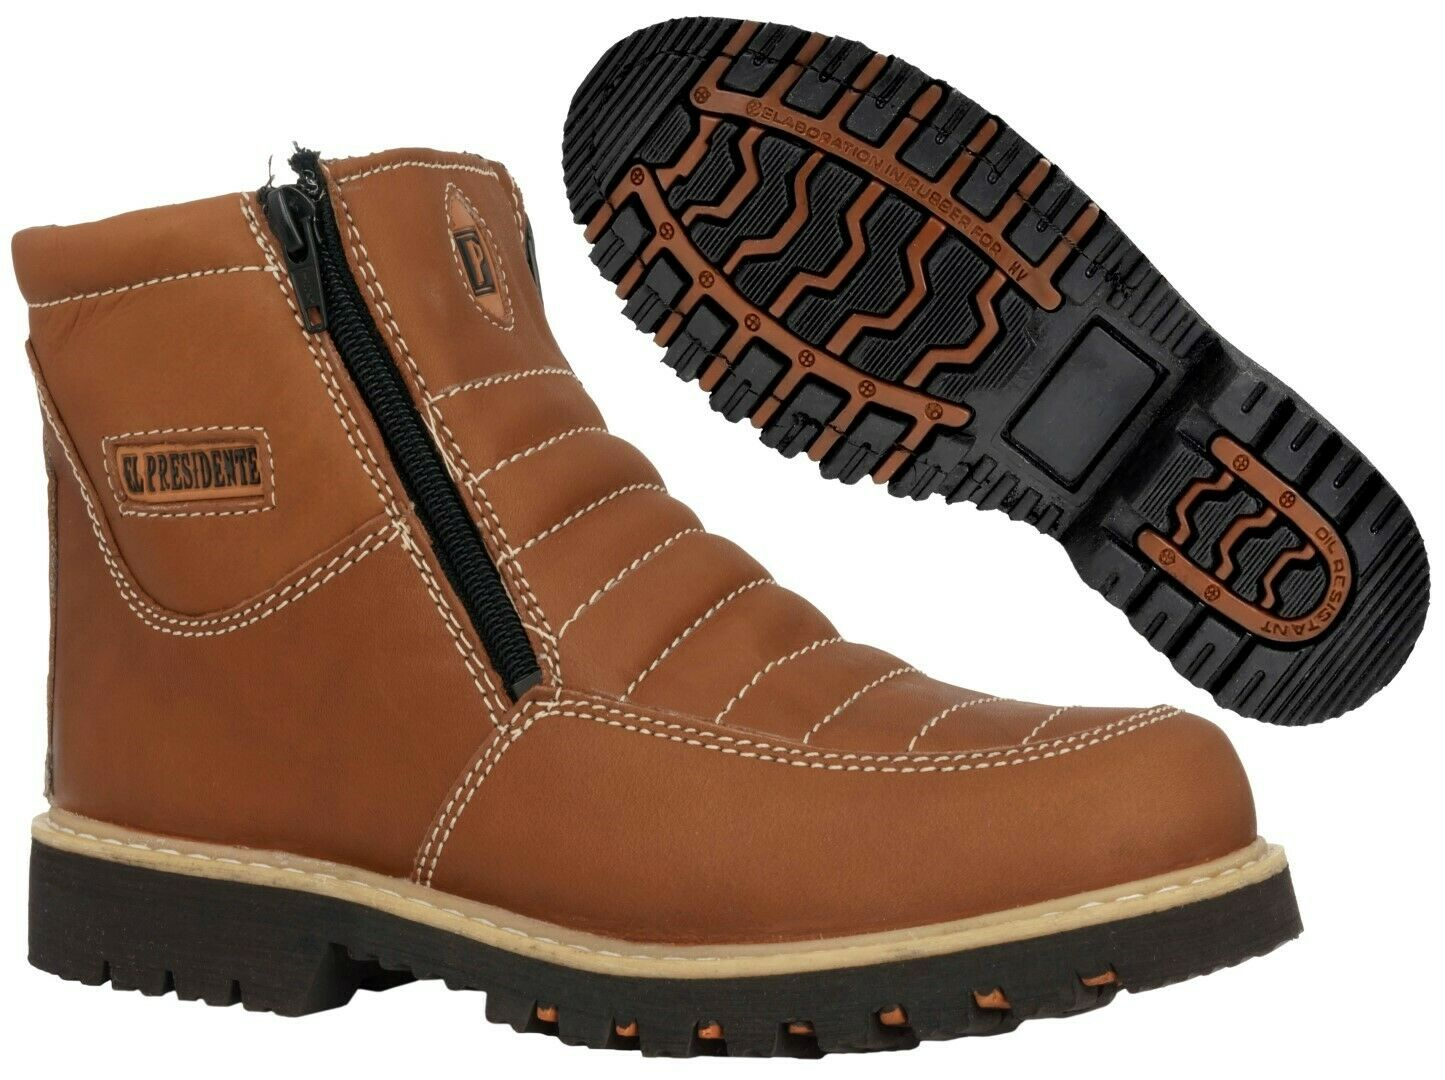 Mens Strong Tough Durable Work Construction Boots shoes Non Slip Sole Tan